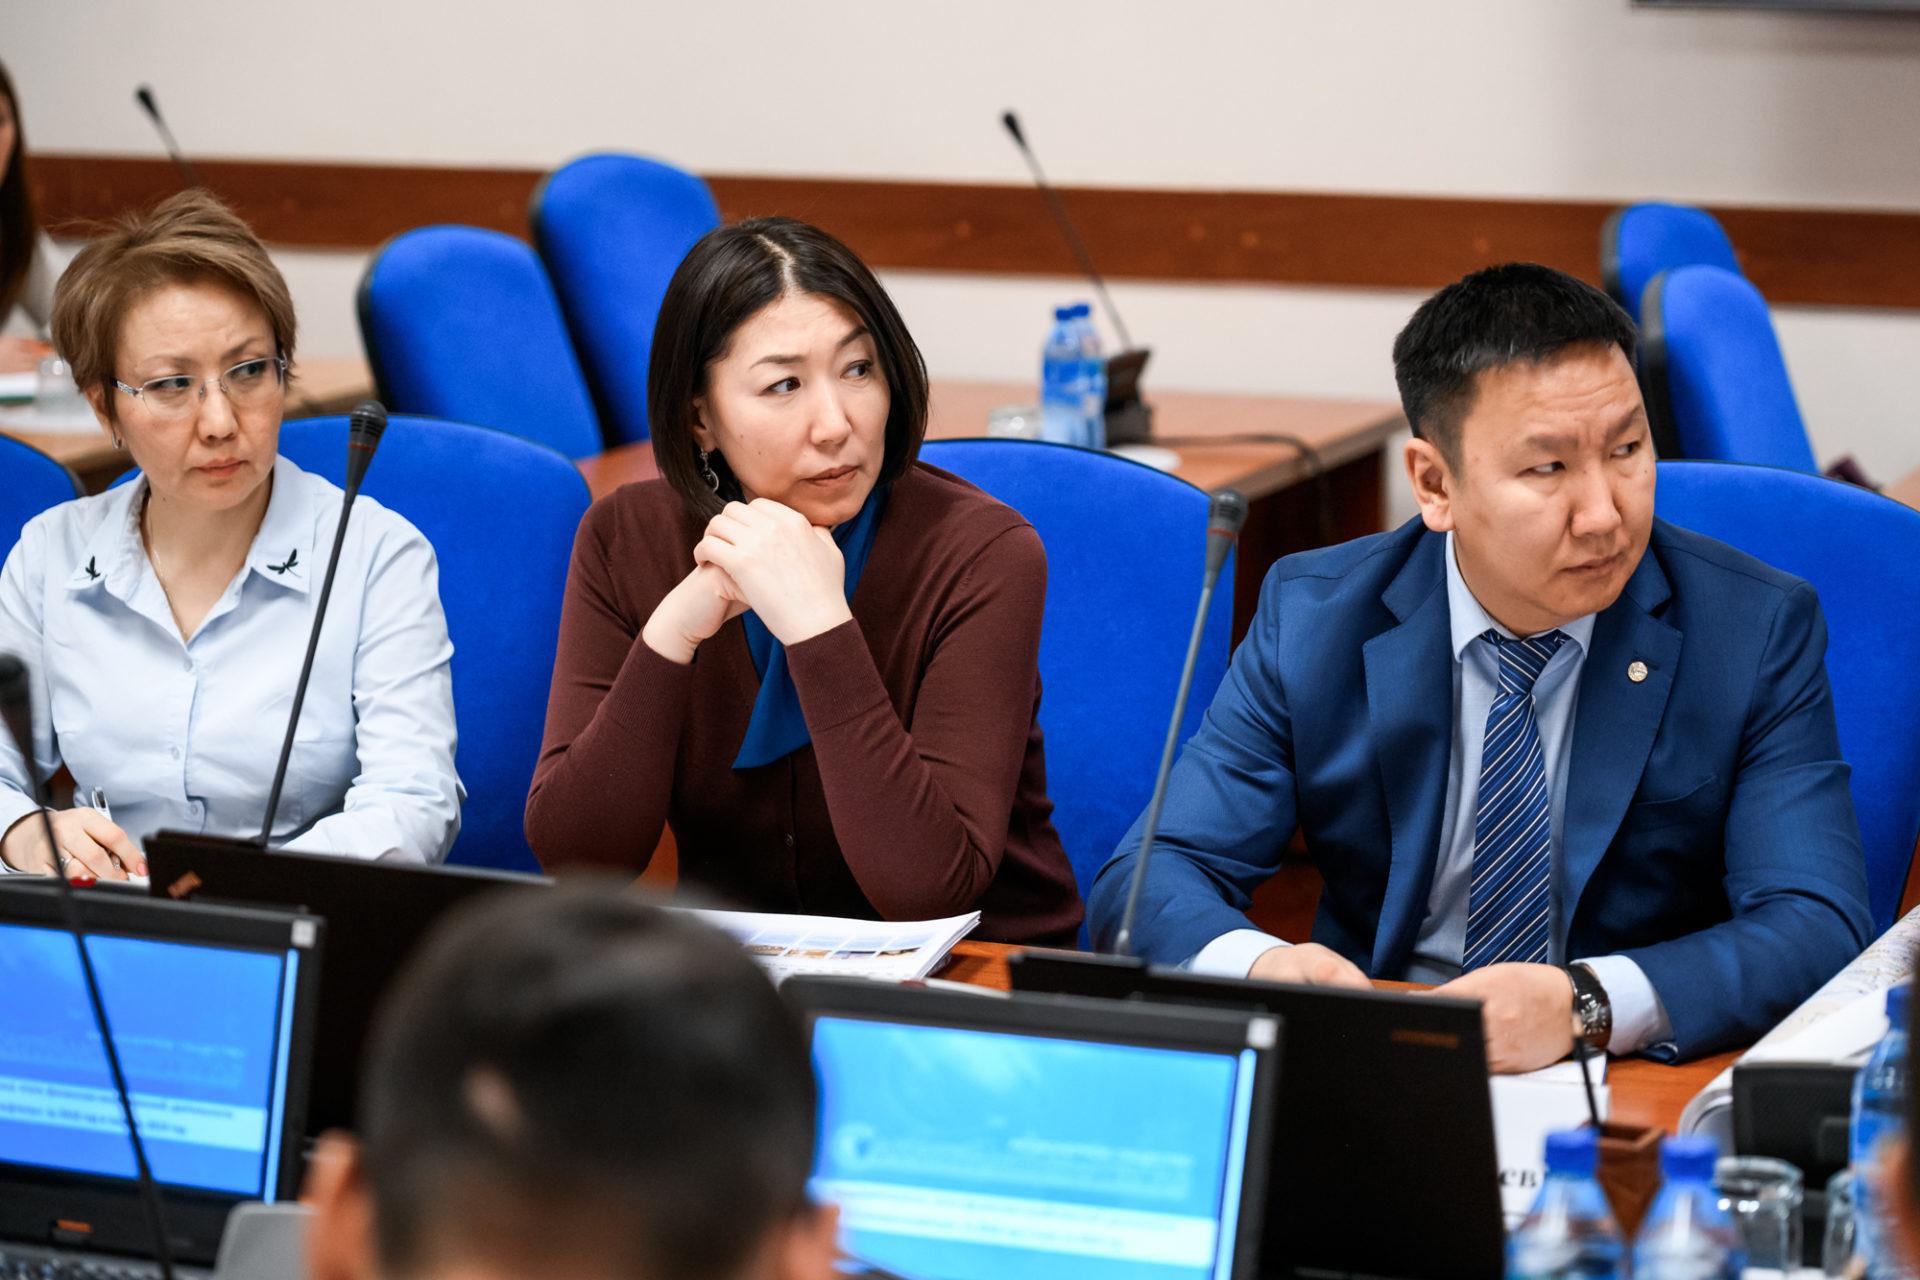 Глава Якутии проверил итоги работы «Сахатранснефтегаза» за год